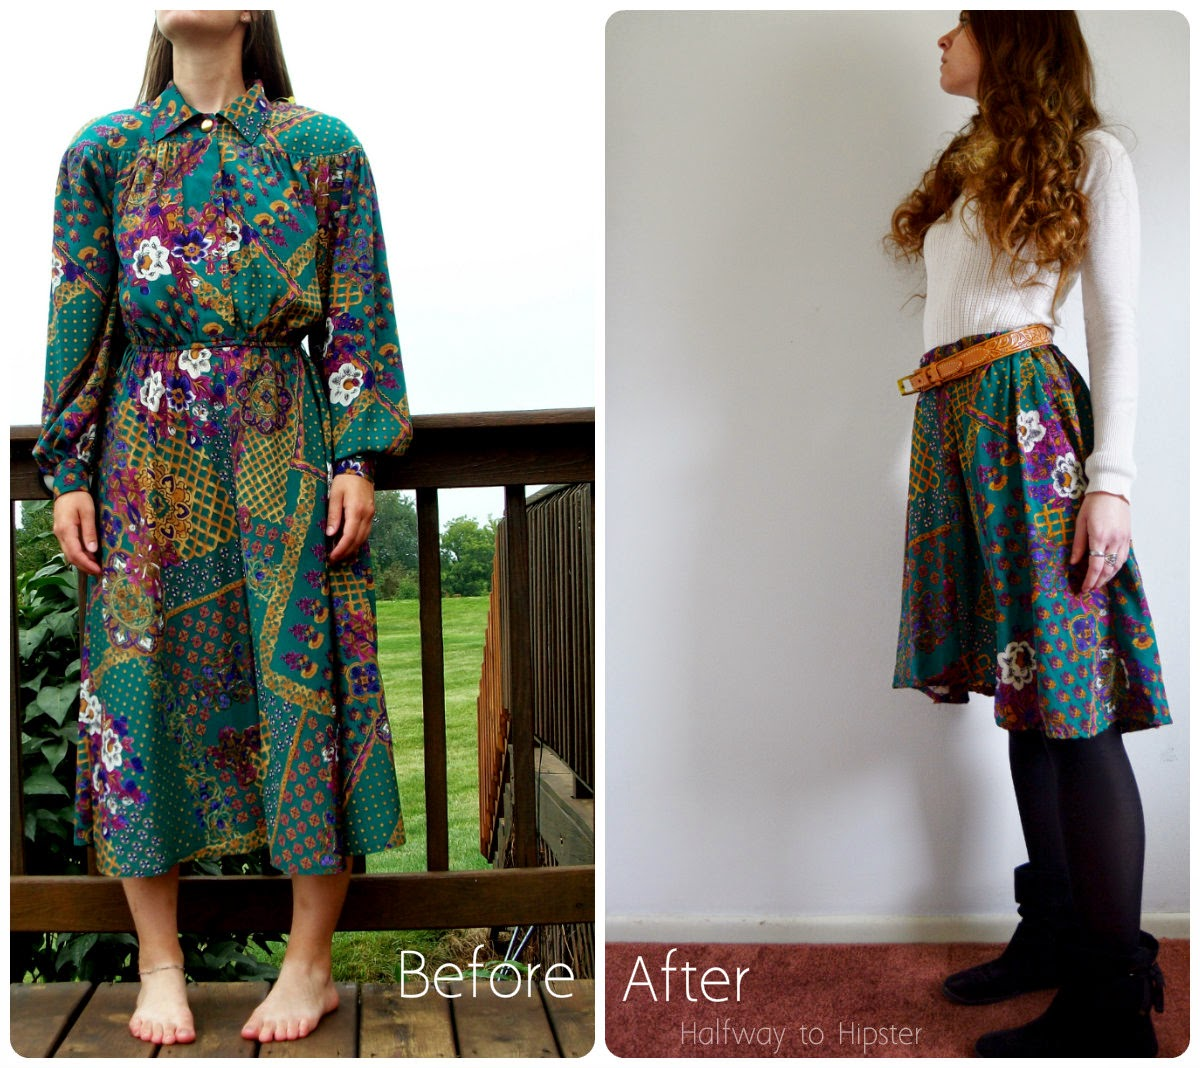 80's Dress to Skirt Refashion